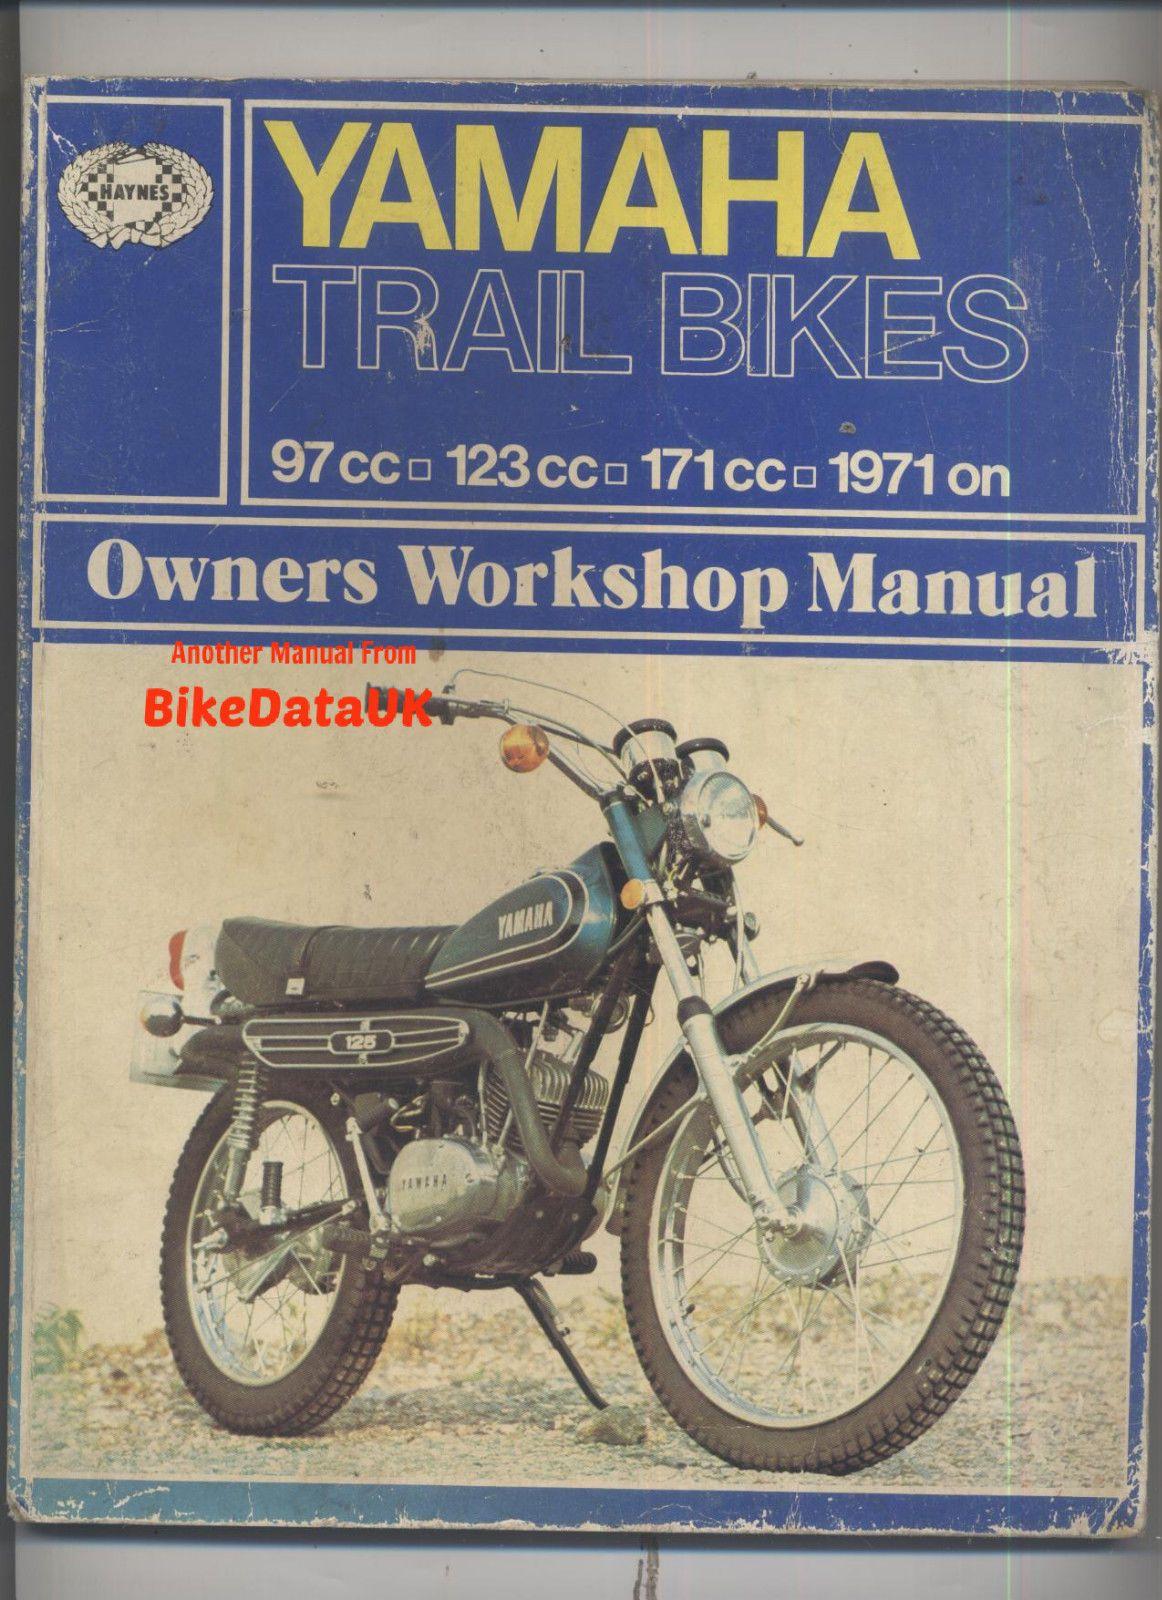 yamaha and trail bikes owner s workshop yamaha 100 125 and 175 trail bikes 1971 85 owner s workshop manual by mansur darlington paperback 1986